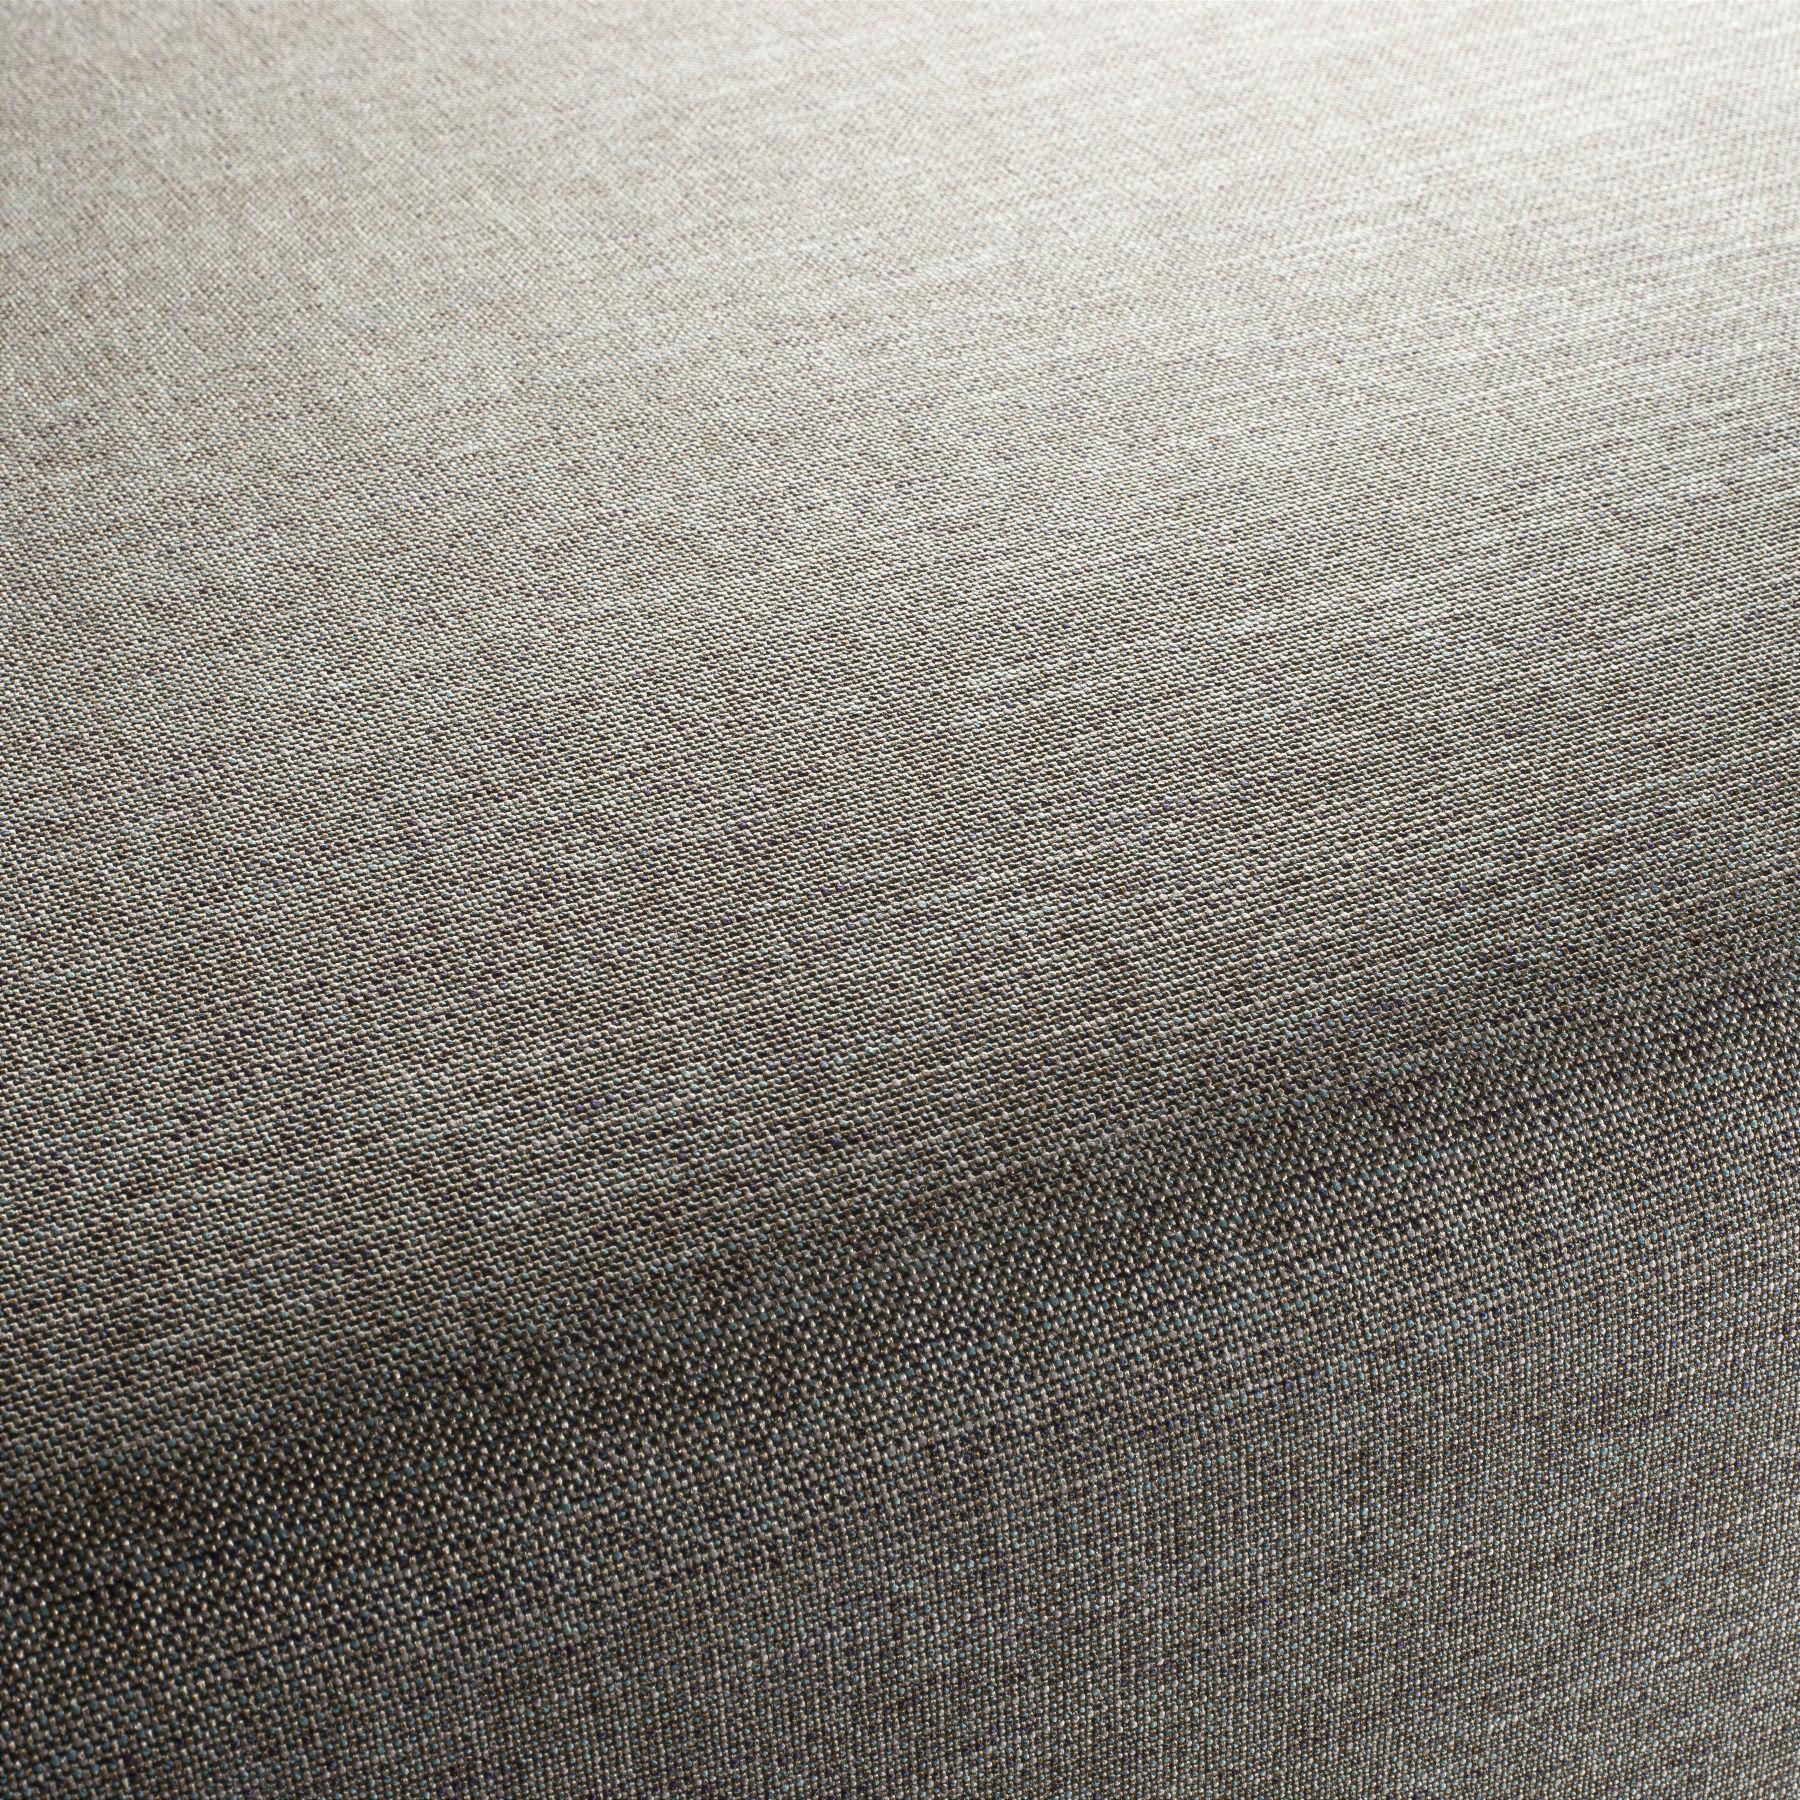 upholstery fabric triston 9 2248 071 jab anstoetz fabrics. Black Bedroom Furniture Sets. Home Design Ideas